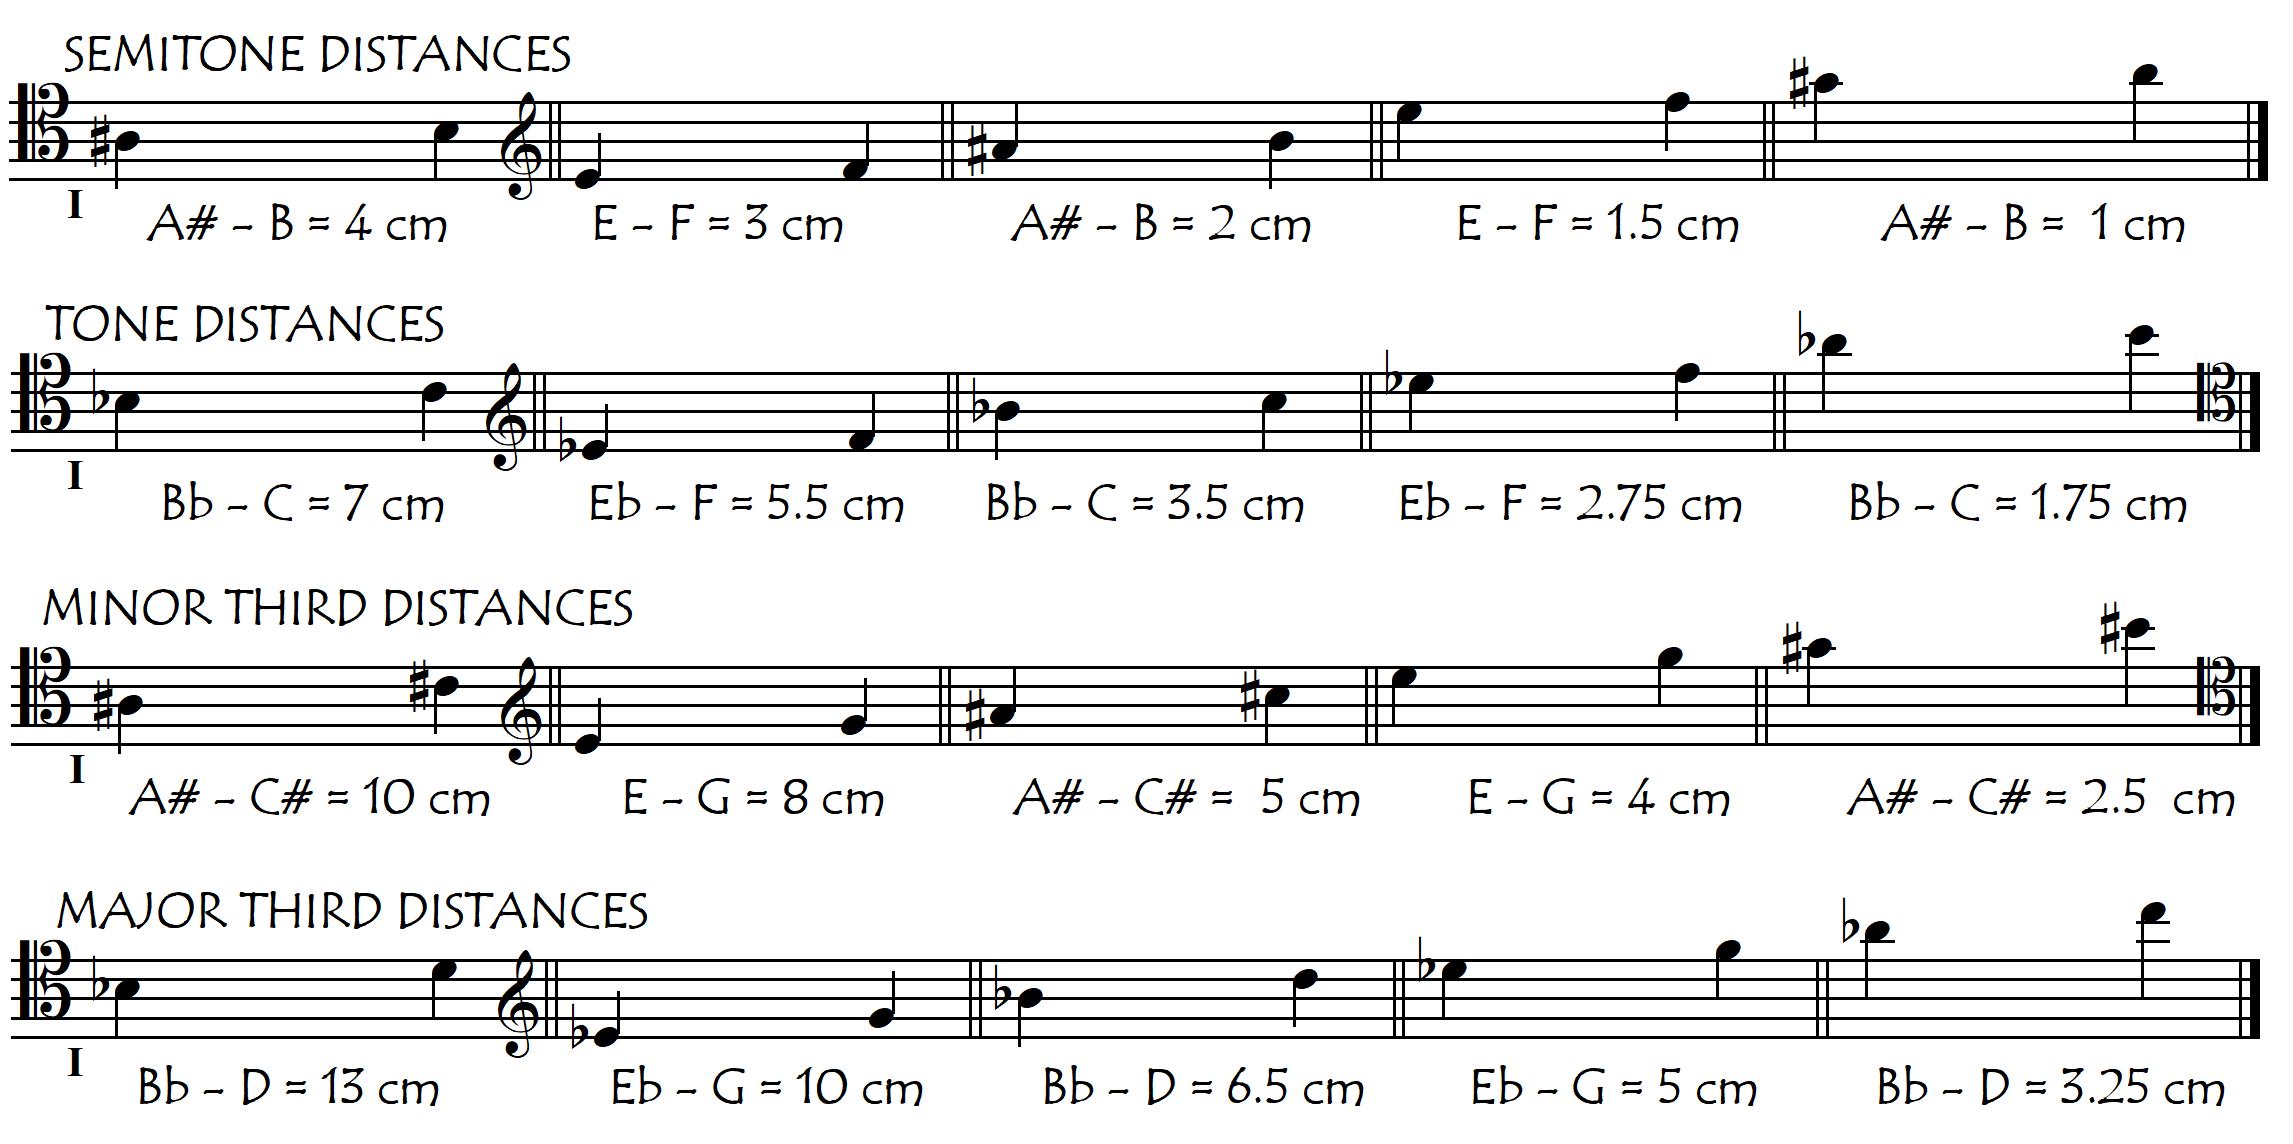 semis tones min3 and maj 3